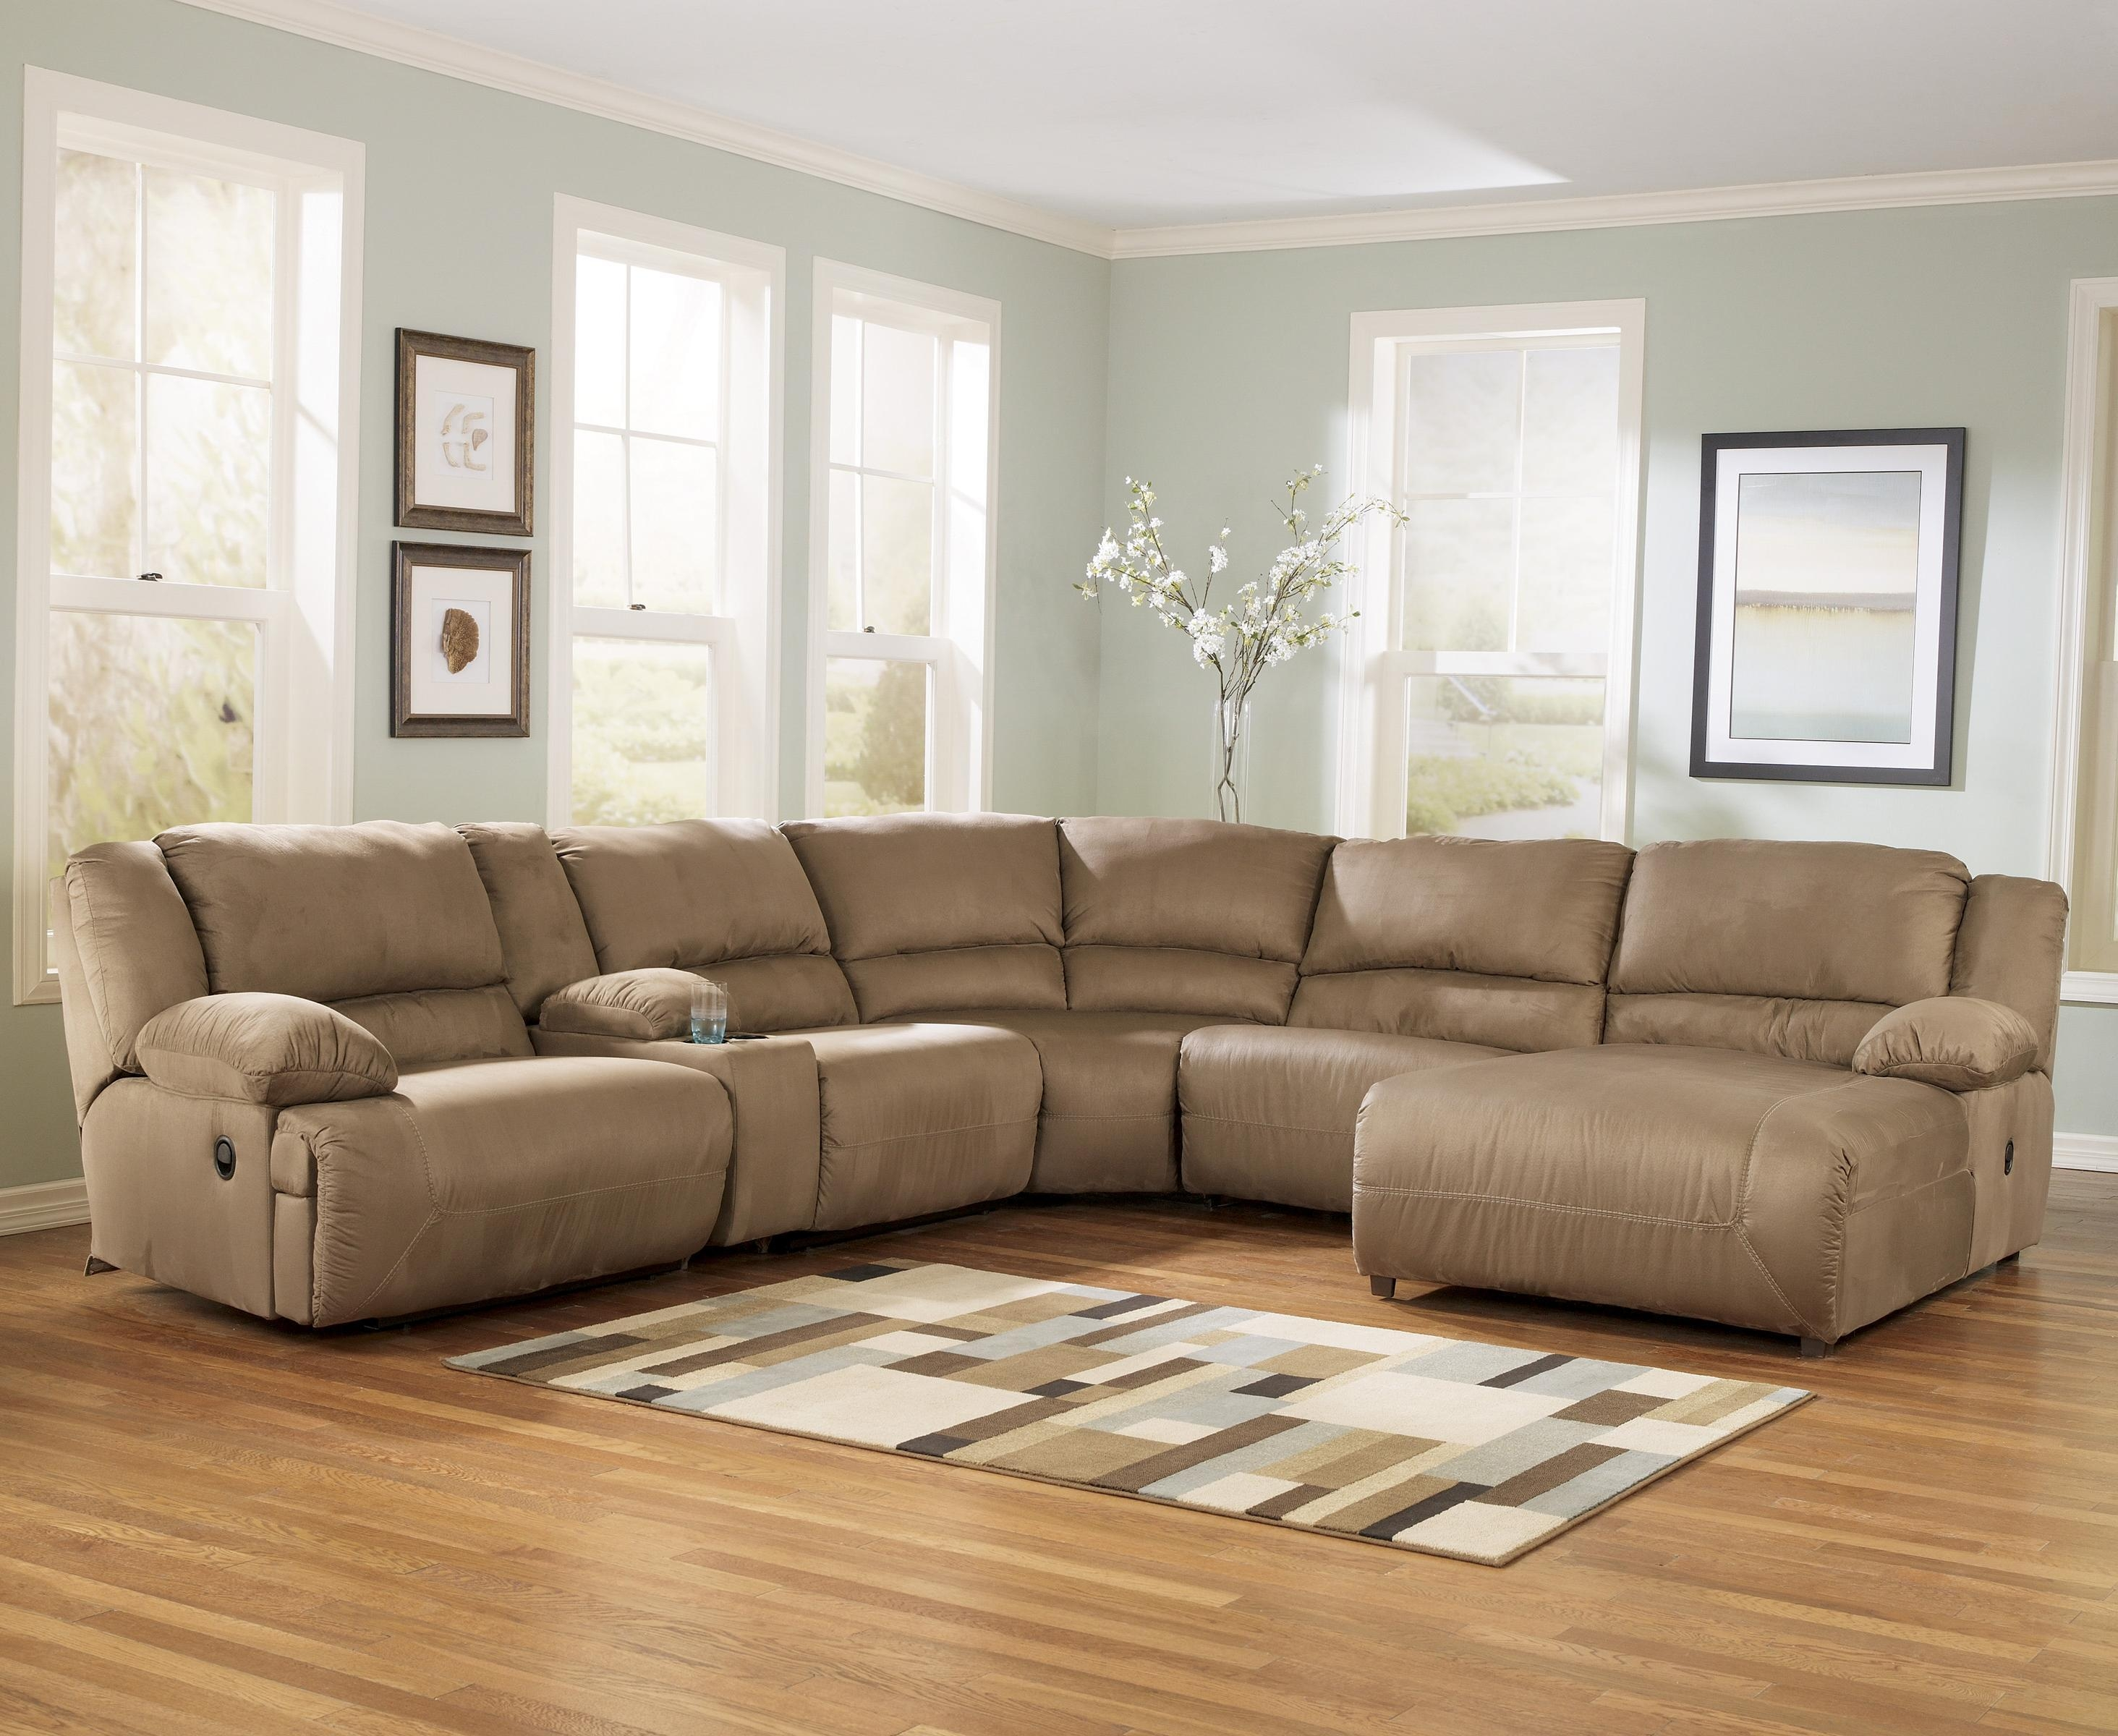 Living Room: Mocha 6 Piece Ashley Furniture Sectionals For Within Ashley Furniture Grenada Sectional (Image 11 of 15)